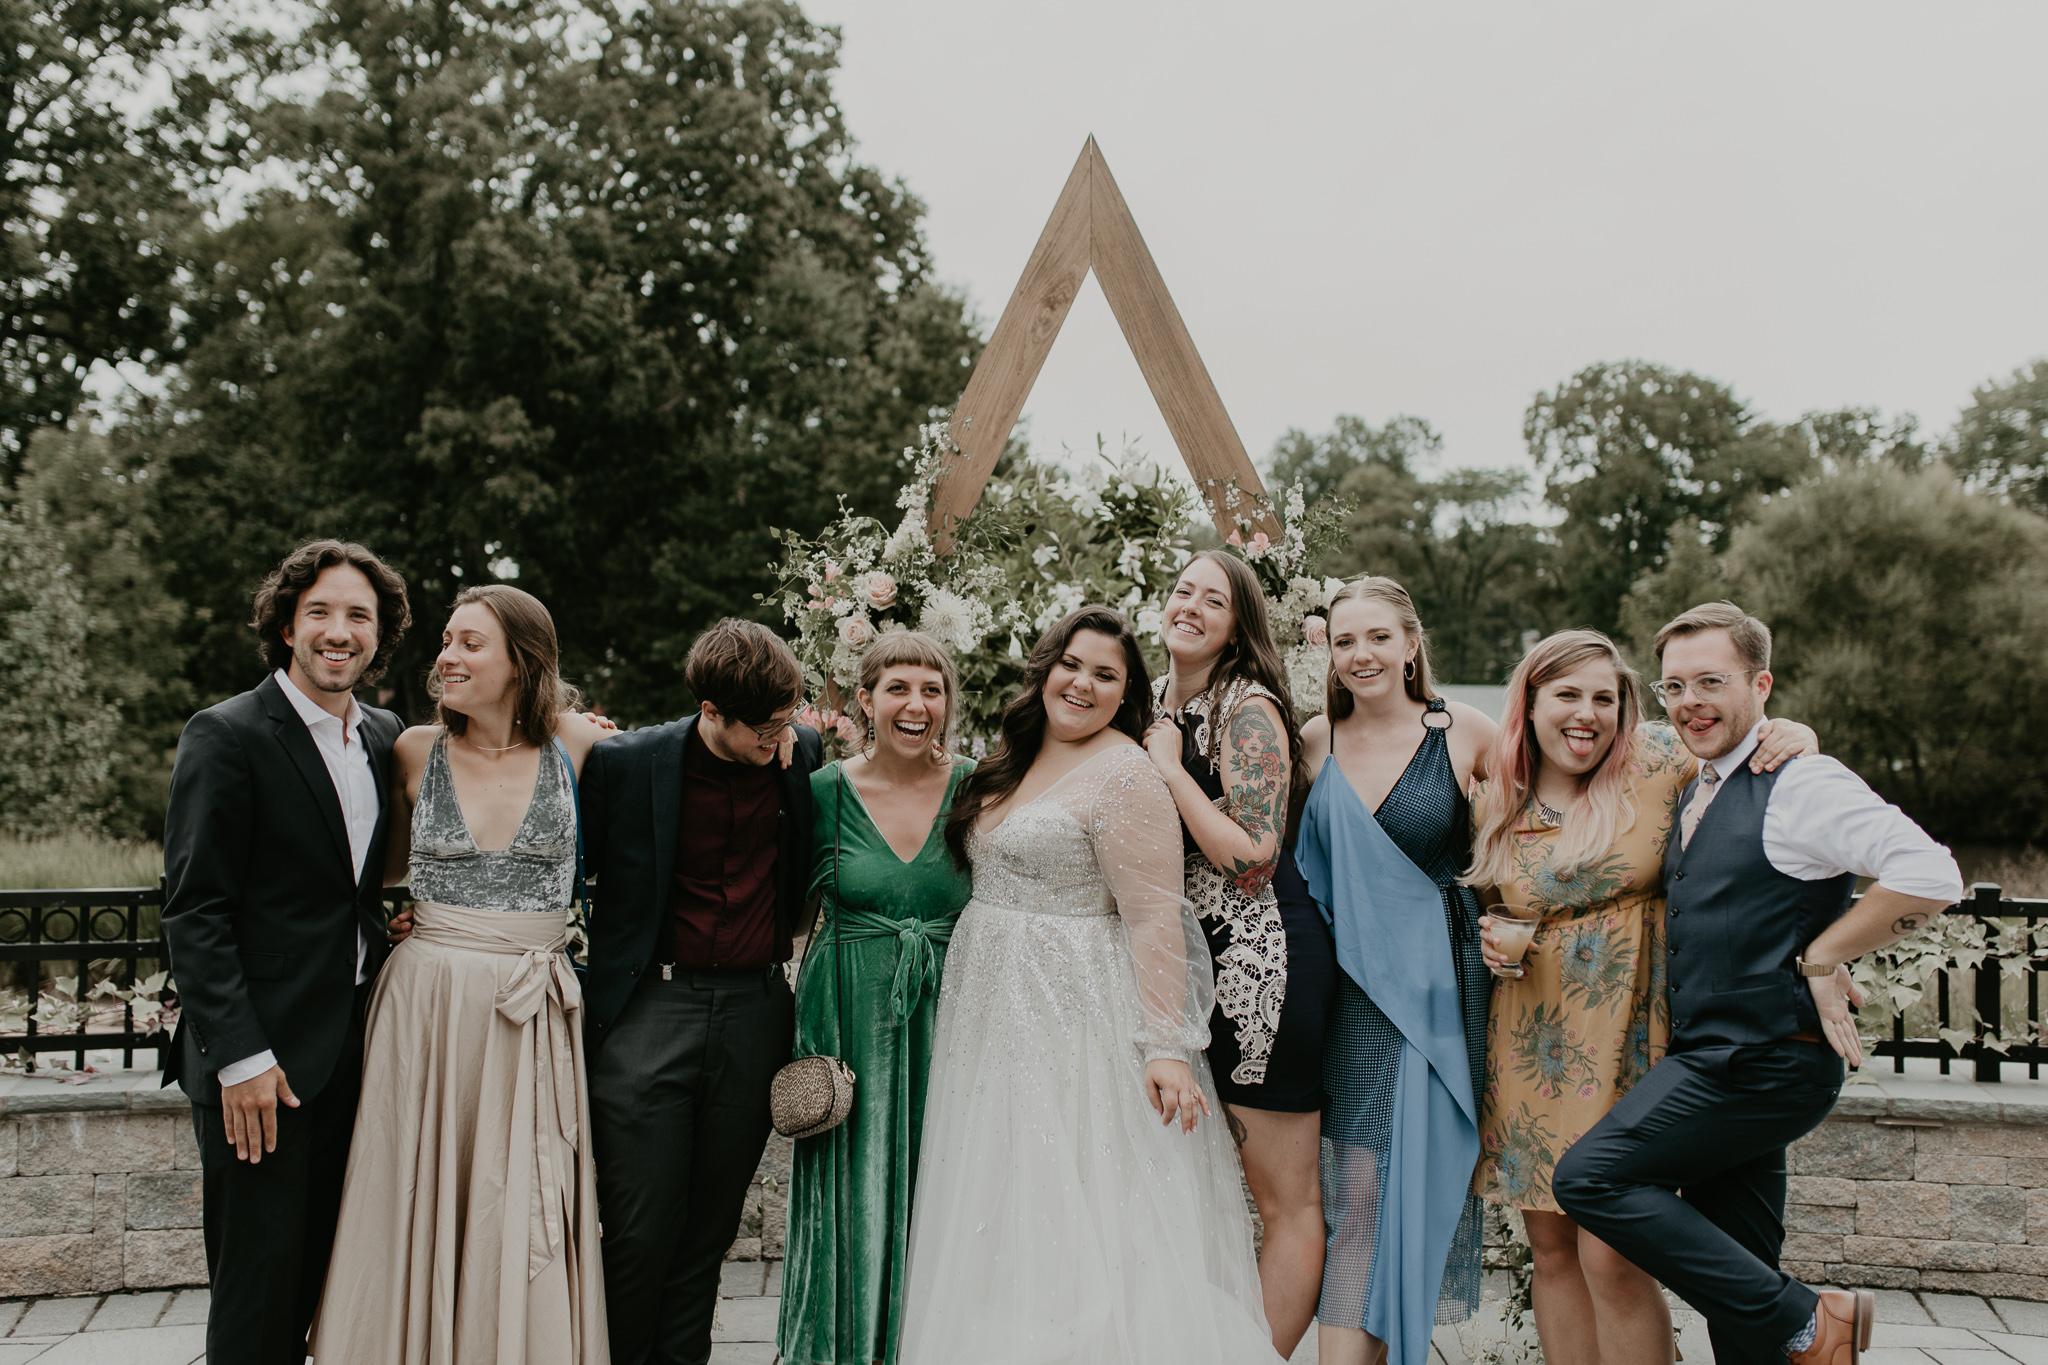 H+A_Hartford_Connecticut_RoseGarden_Wedding068.jpg